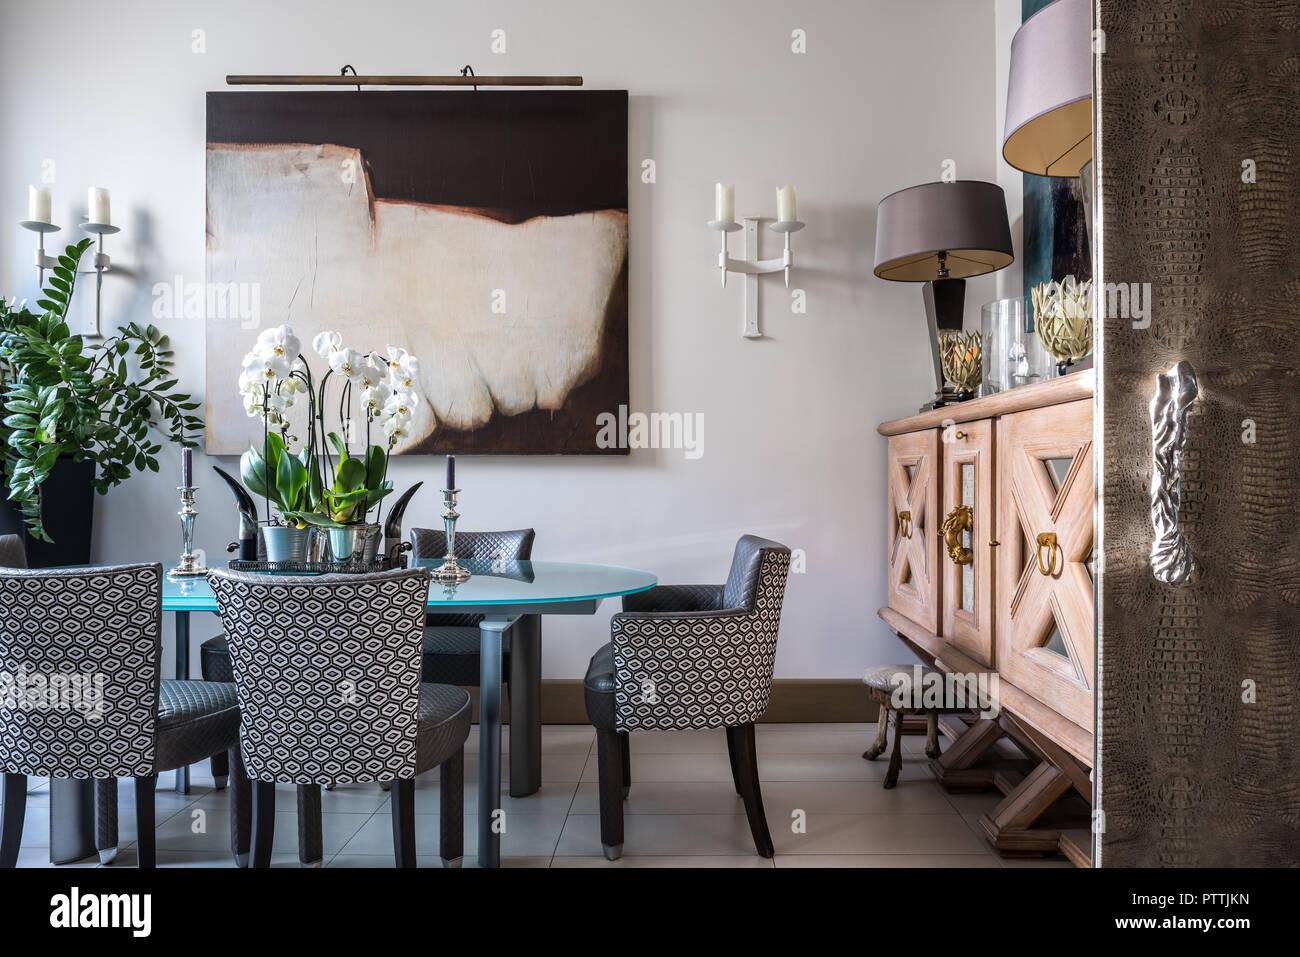 Credenza Moderna Sala Da Pranzo : Grande credenza in legno e arte moderna nella sala da pranzo con